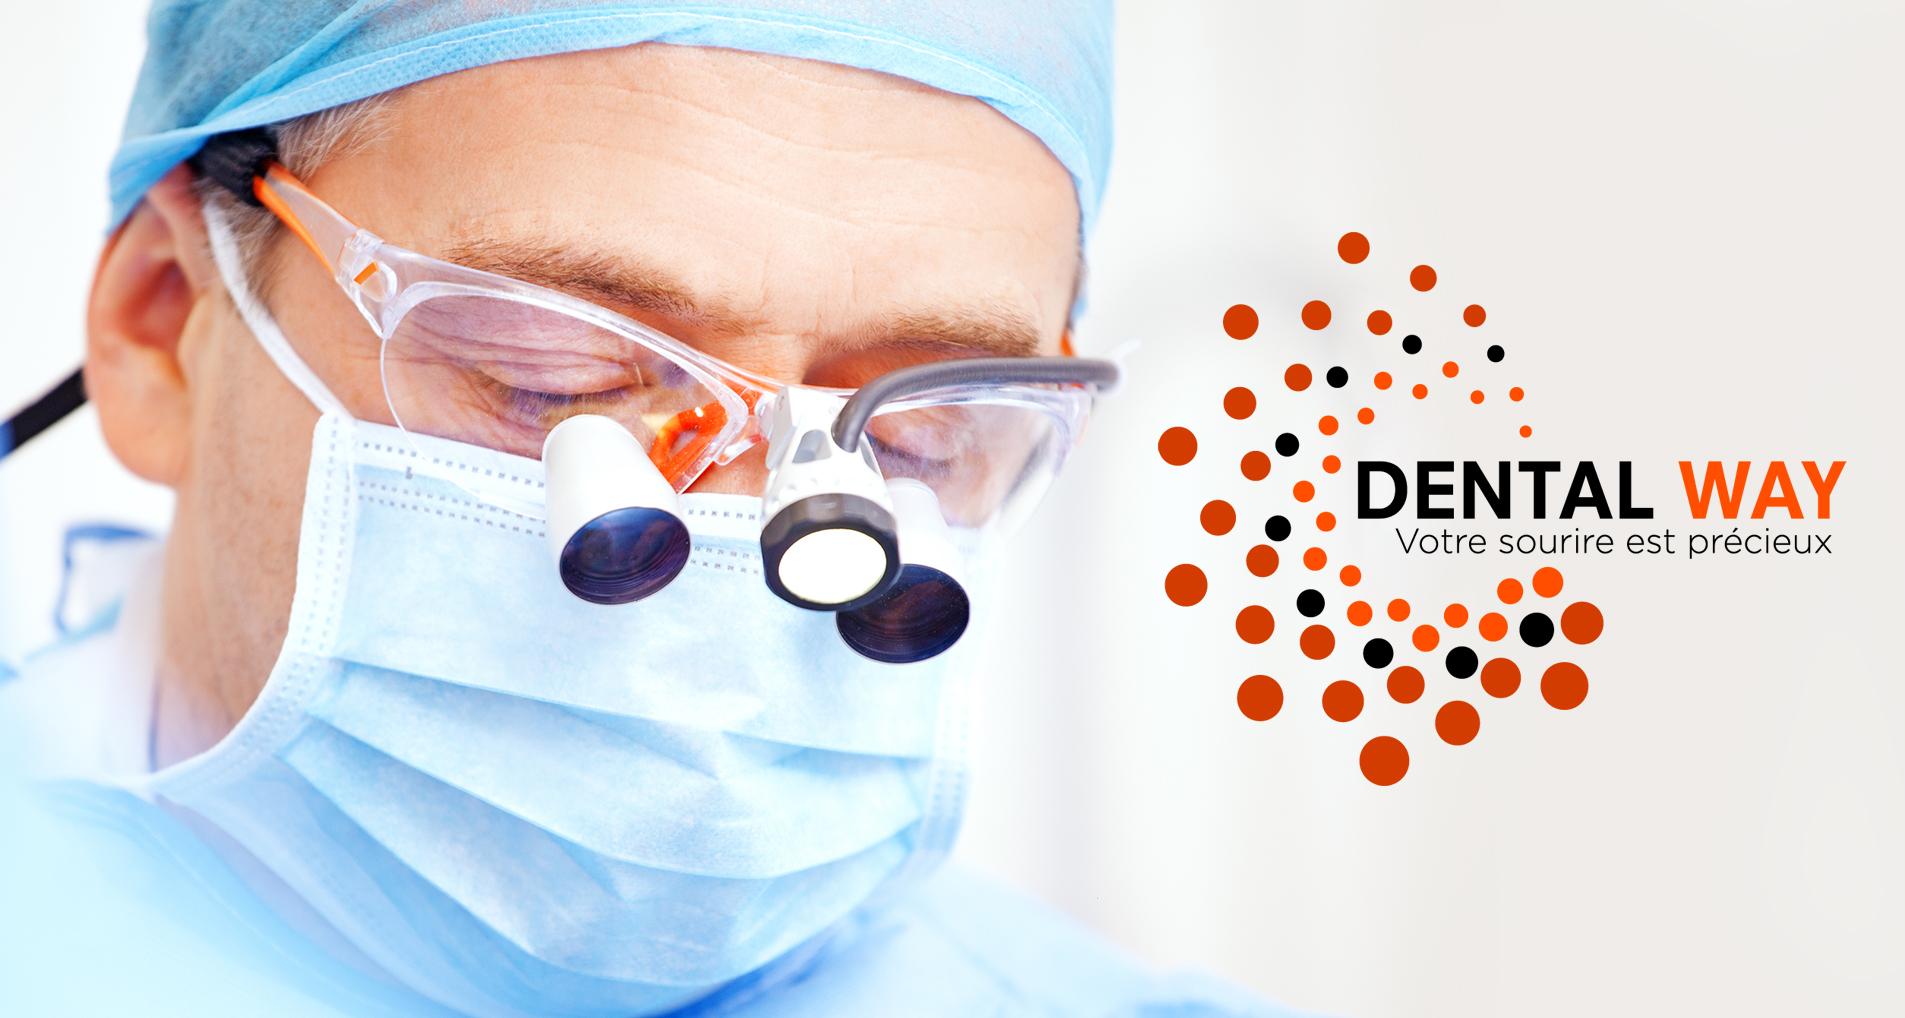 extraction-dent-sagesse-dental way